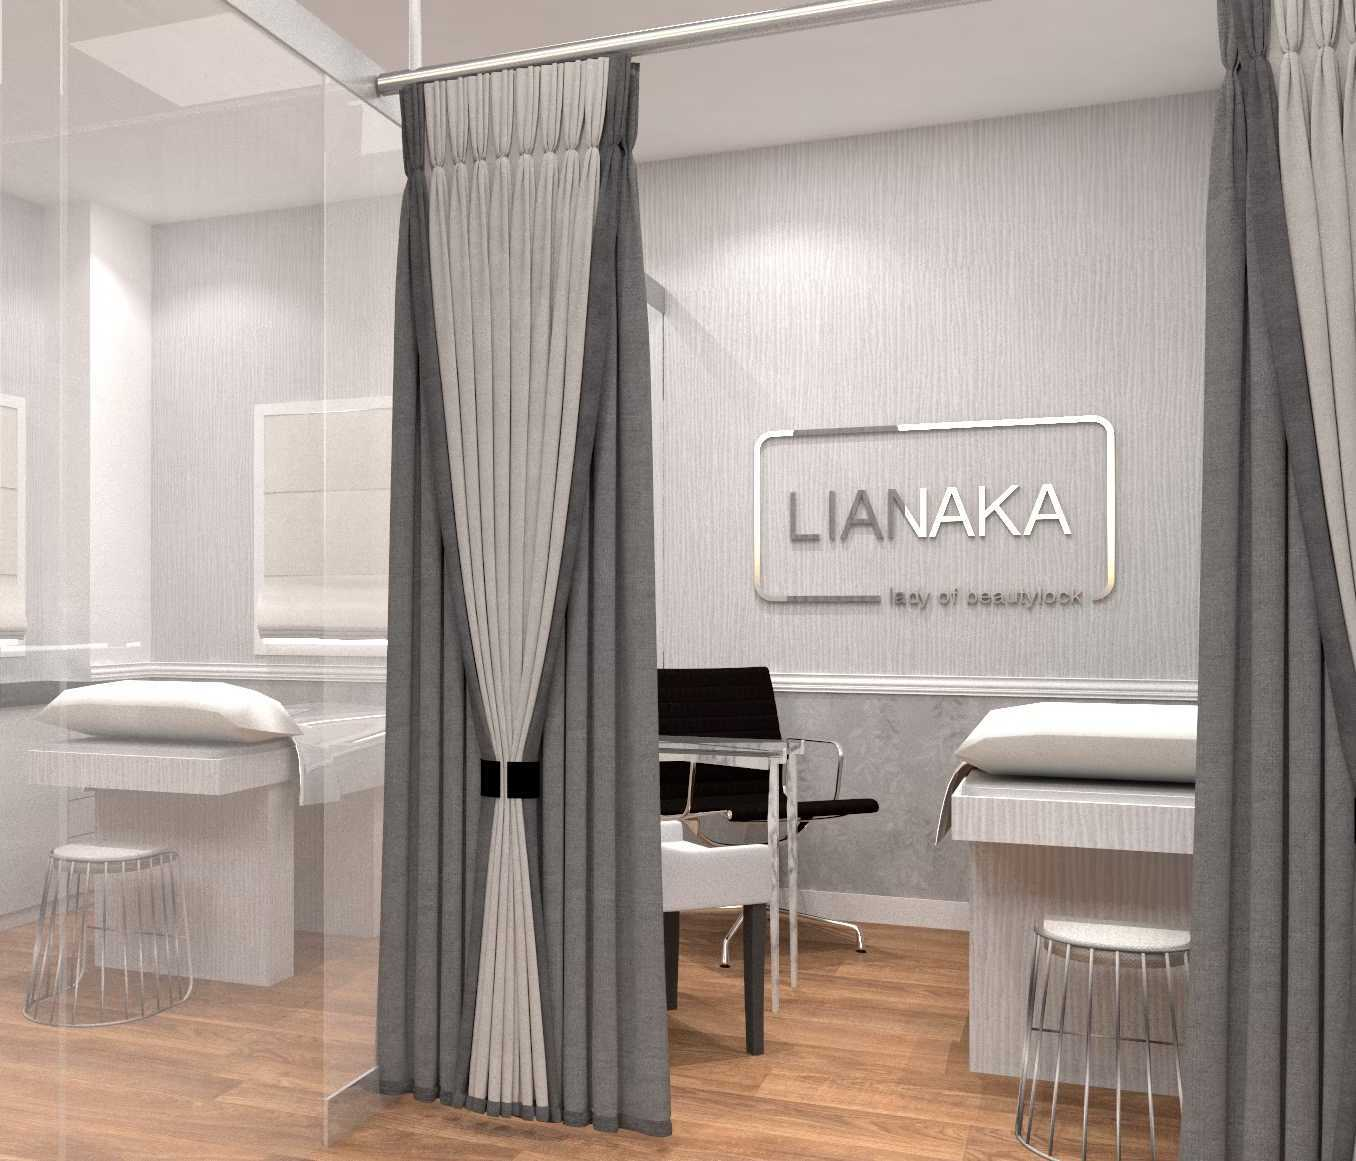 9596 Design Studio Lianaka Skin Clinic Cibubur, Kec. Ciracas, Kota Jakarta Timur, Daerah Khusus Ibukota Jakarta, Indonesia Cibubur, Kec. Ciracas, Kota Jakarta Timur, Daerah Khusus Ibukota Jakarta, Indonesia 9596-Design-Studio-Lianaka-Skin-Clinic  122573